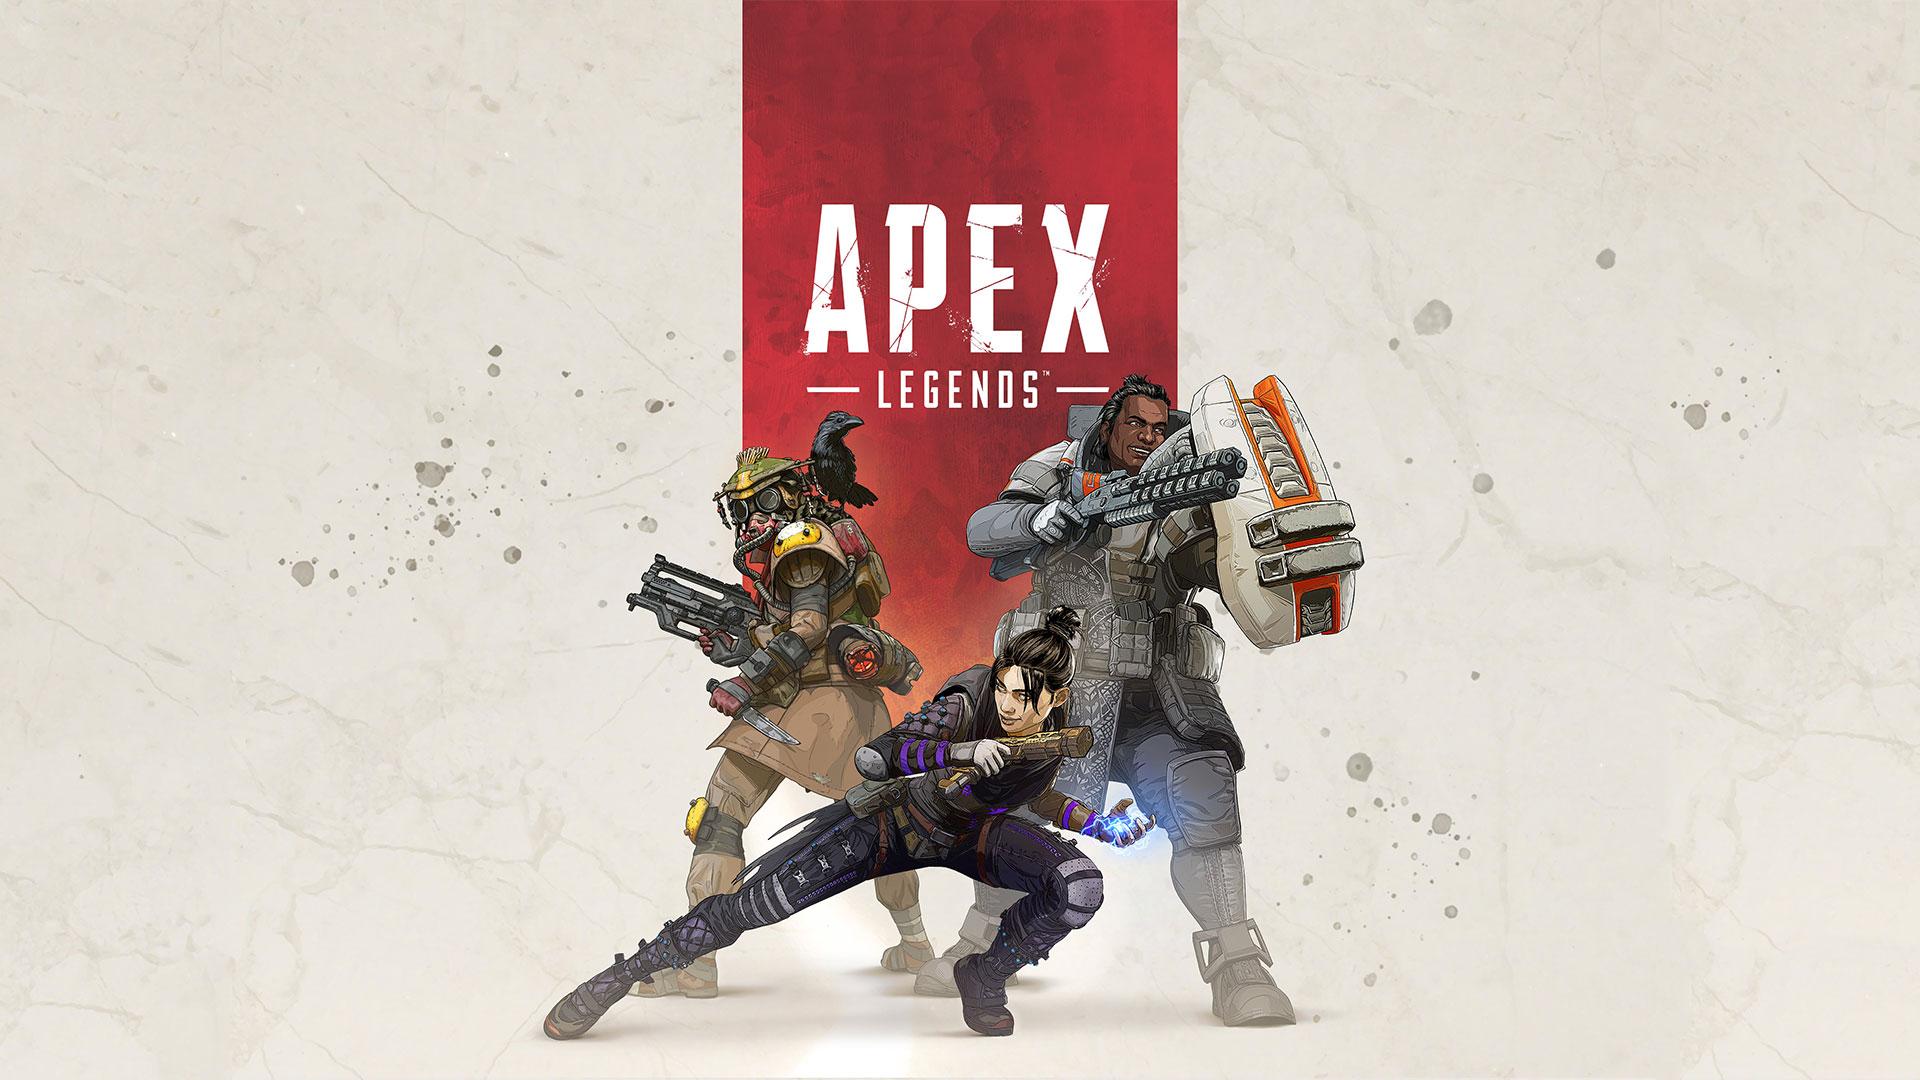 Apex Legends [Origin] + Warranty 2019